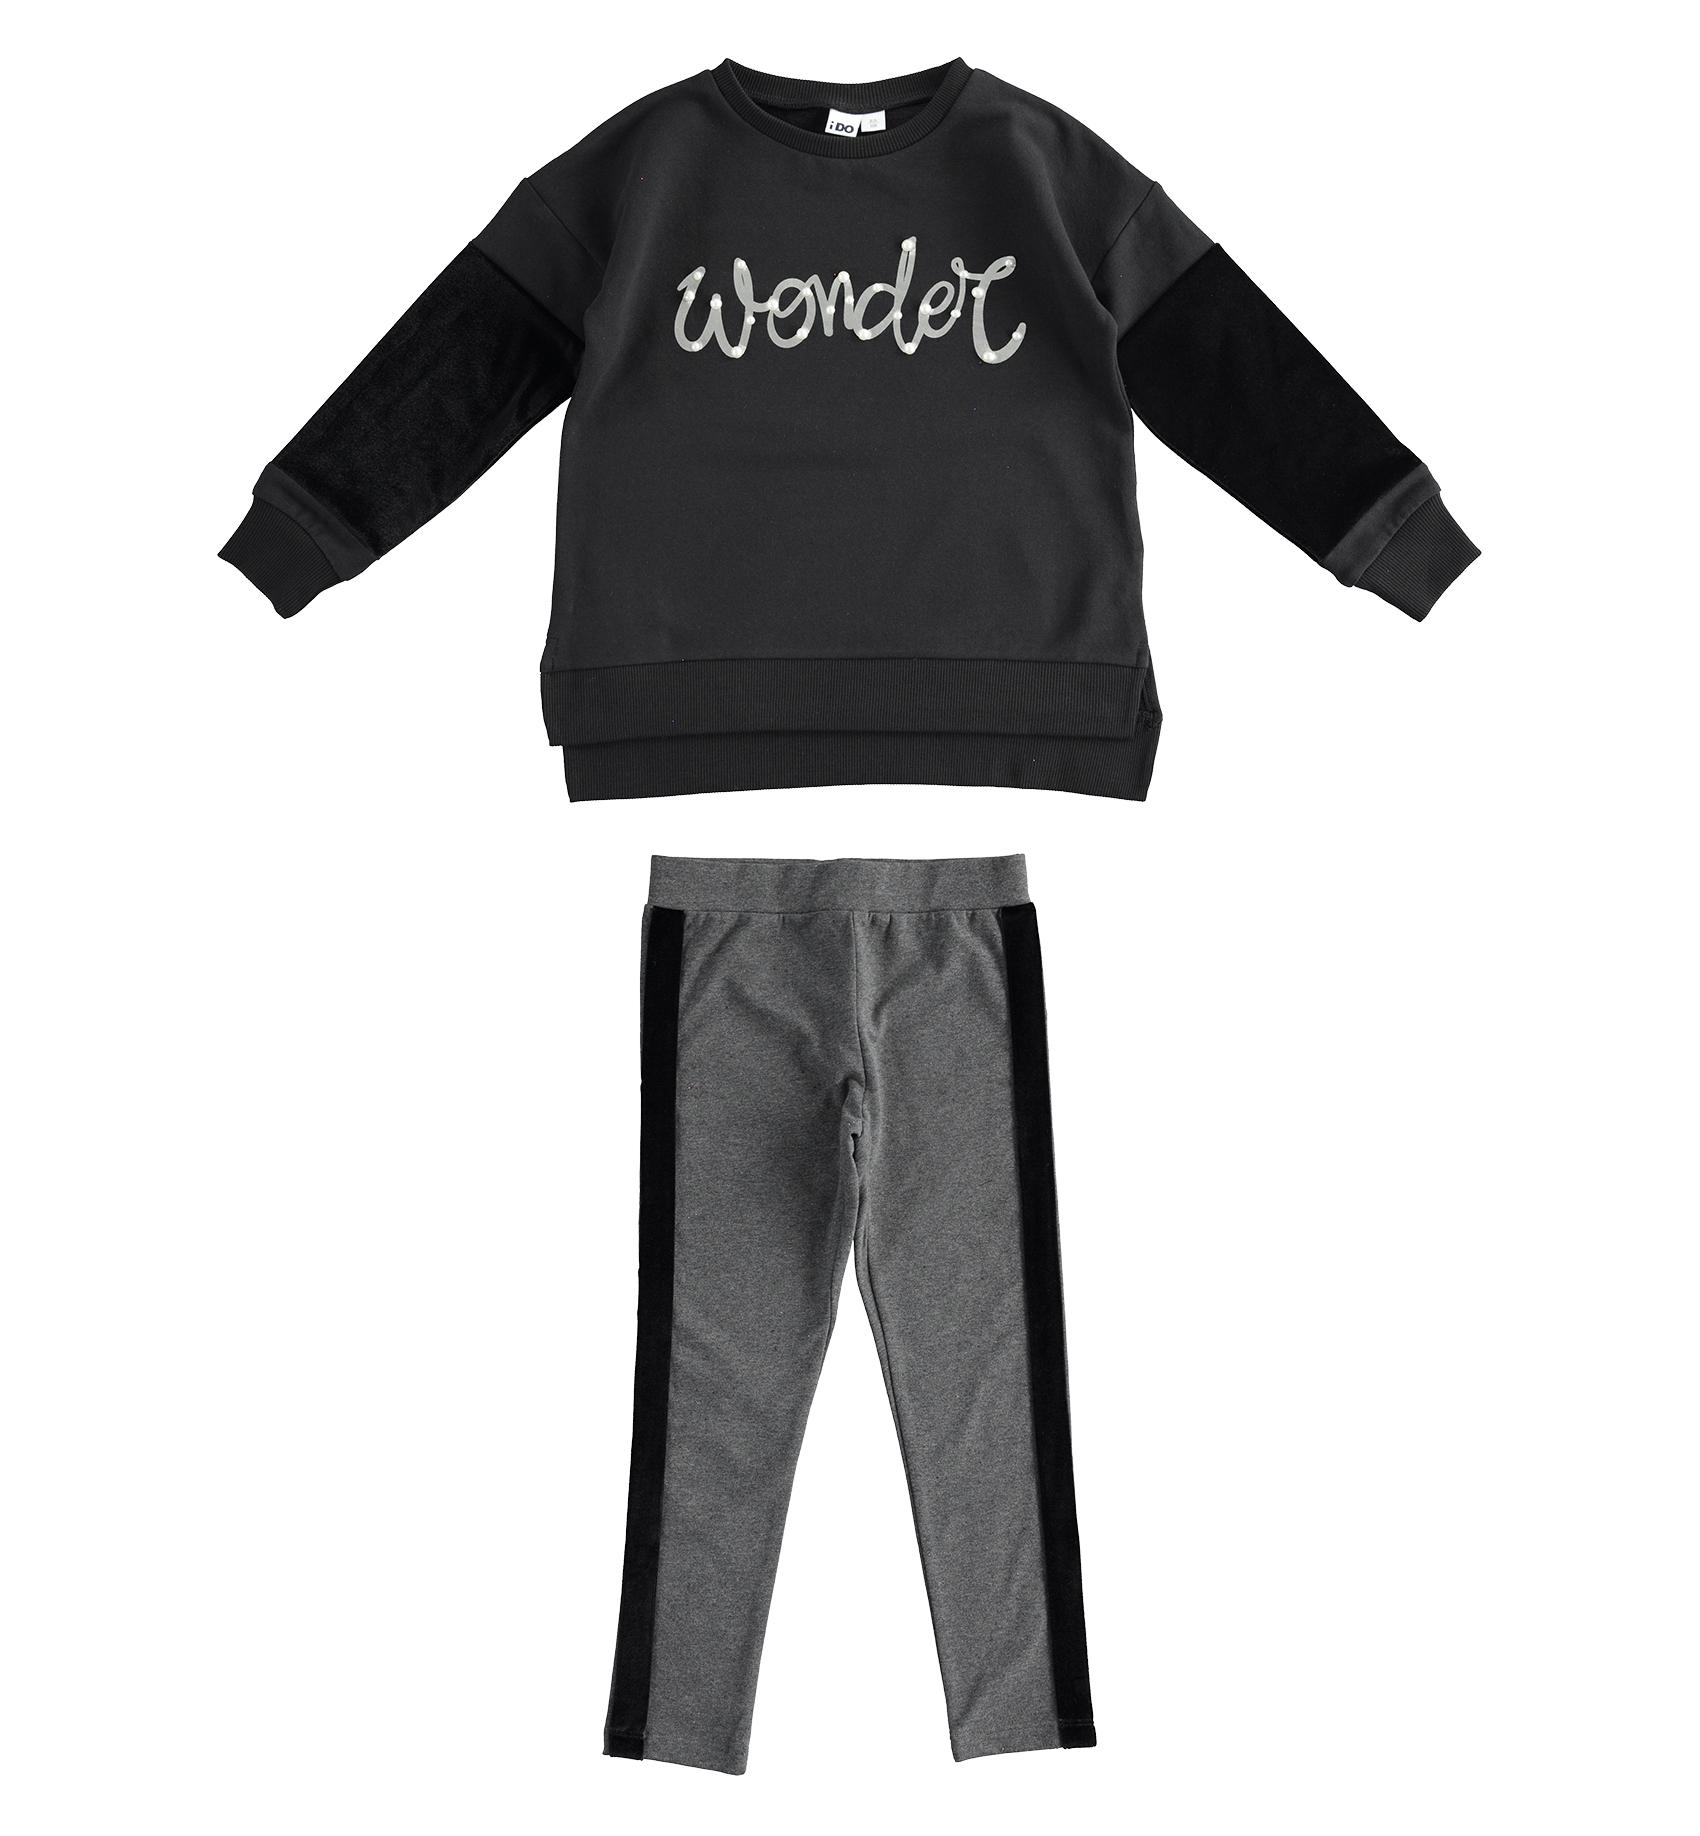 fekete pamut felső pamut leggings